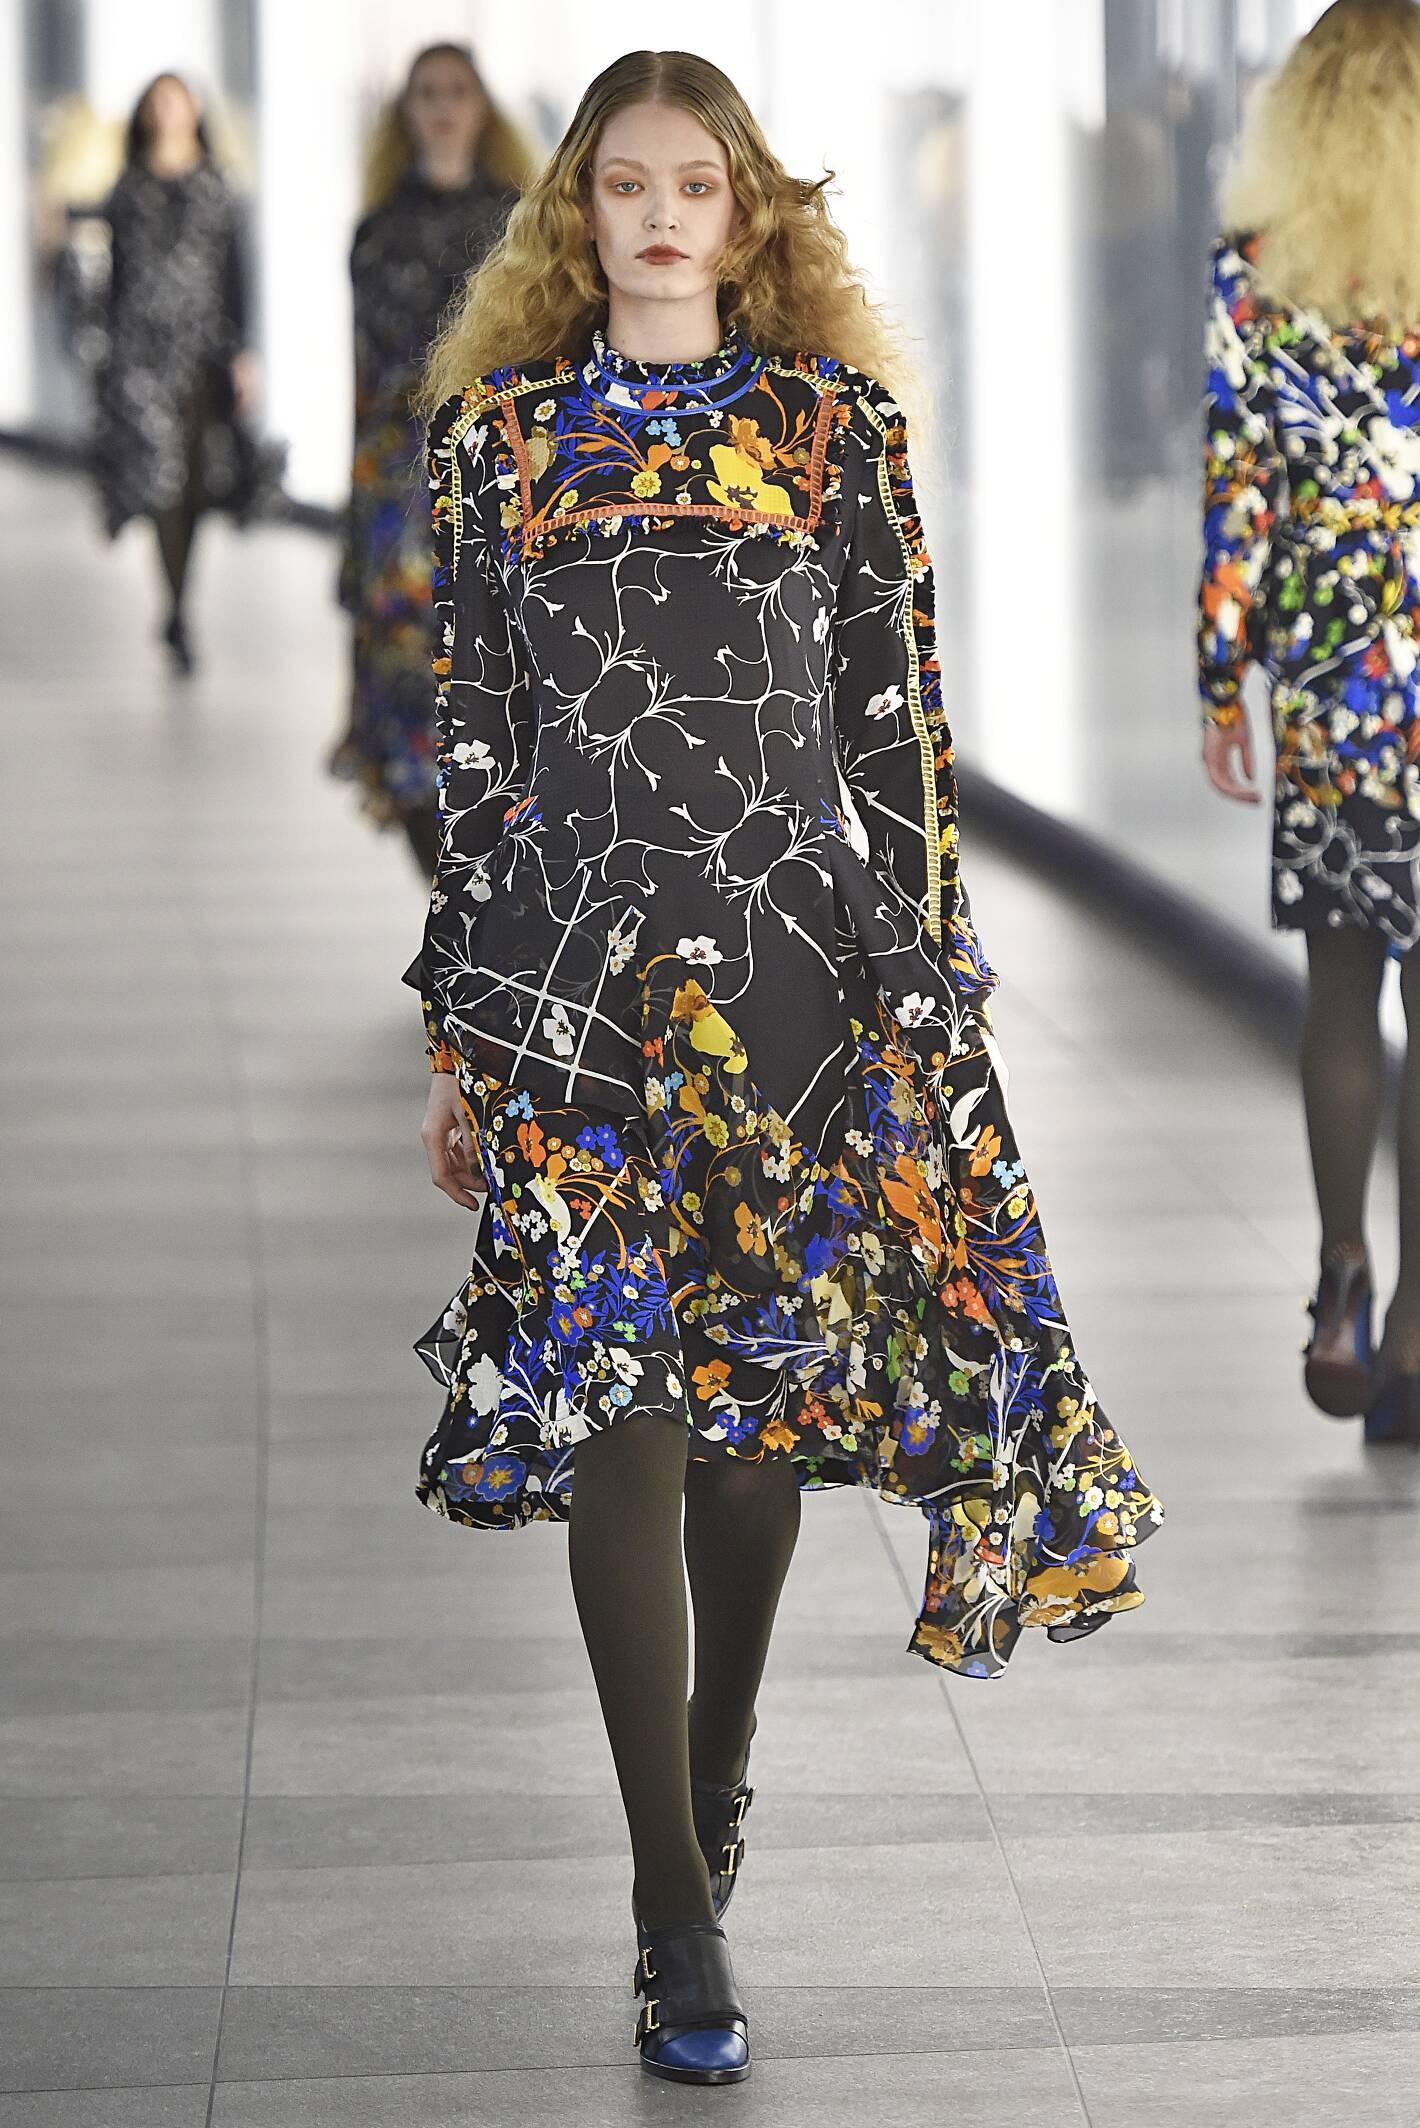 Winter 2015 Fashion Trends Preen by Thornton Bregazzi Collection